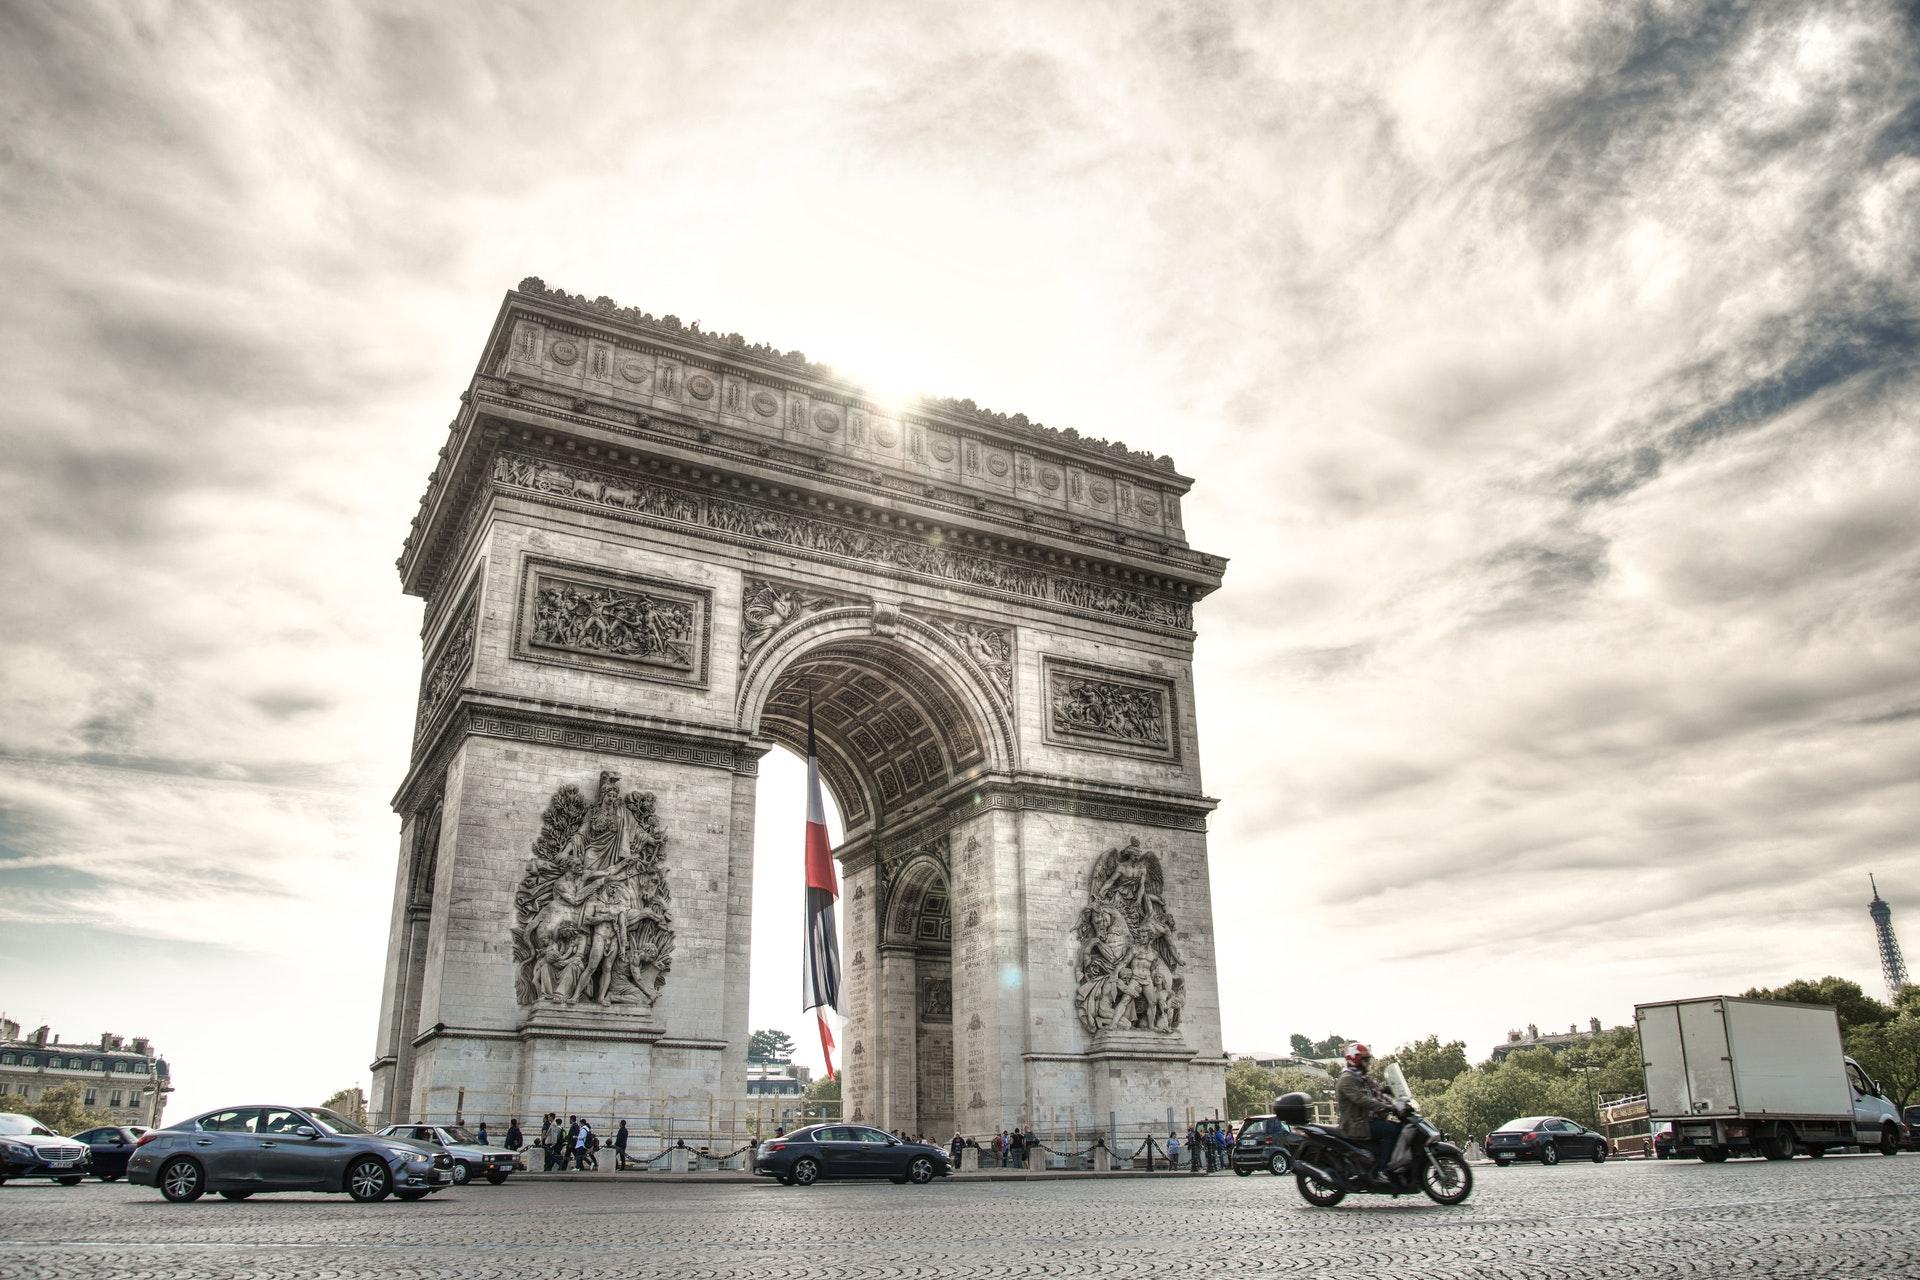 Paris in 3 days- Arc de triomphe